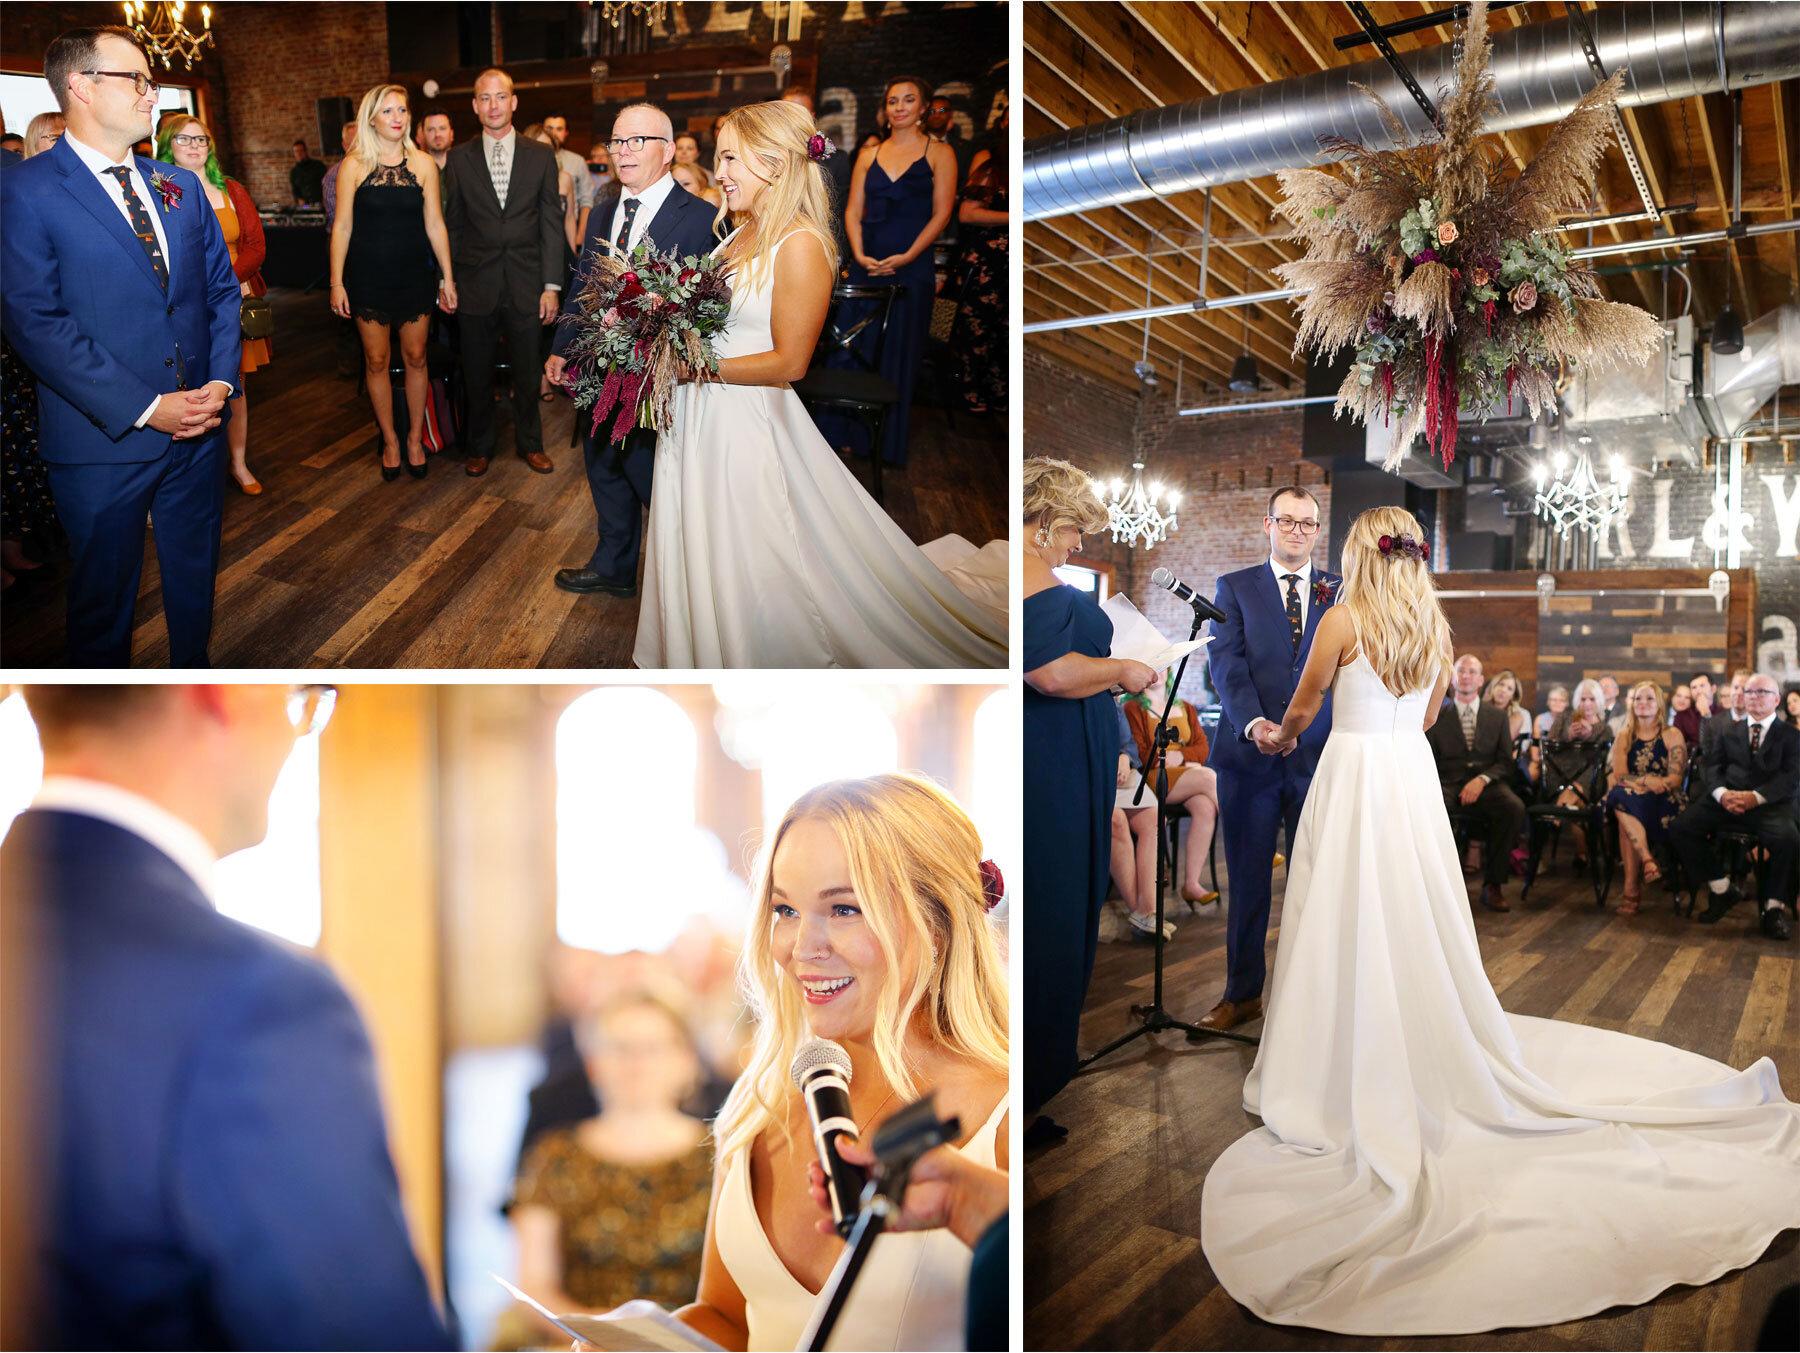 09-Vick-Photography-Wedding-Minneapolis-Minnesota-Earl-and-Wilson-Bride-Groom-Ceremony-Danielle-and-Tom.jpg